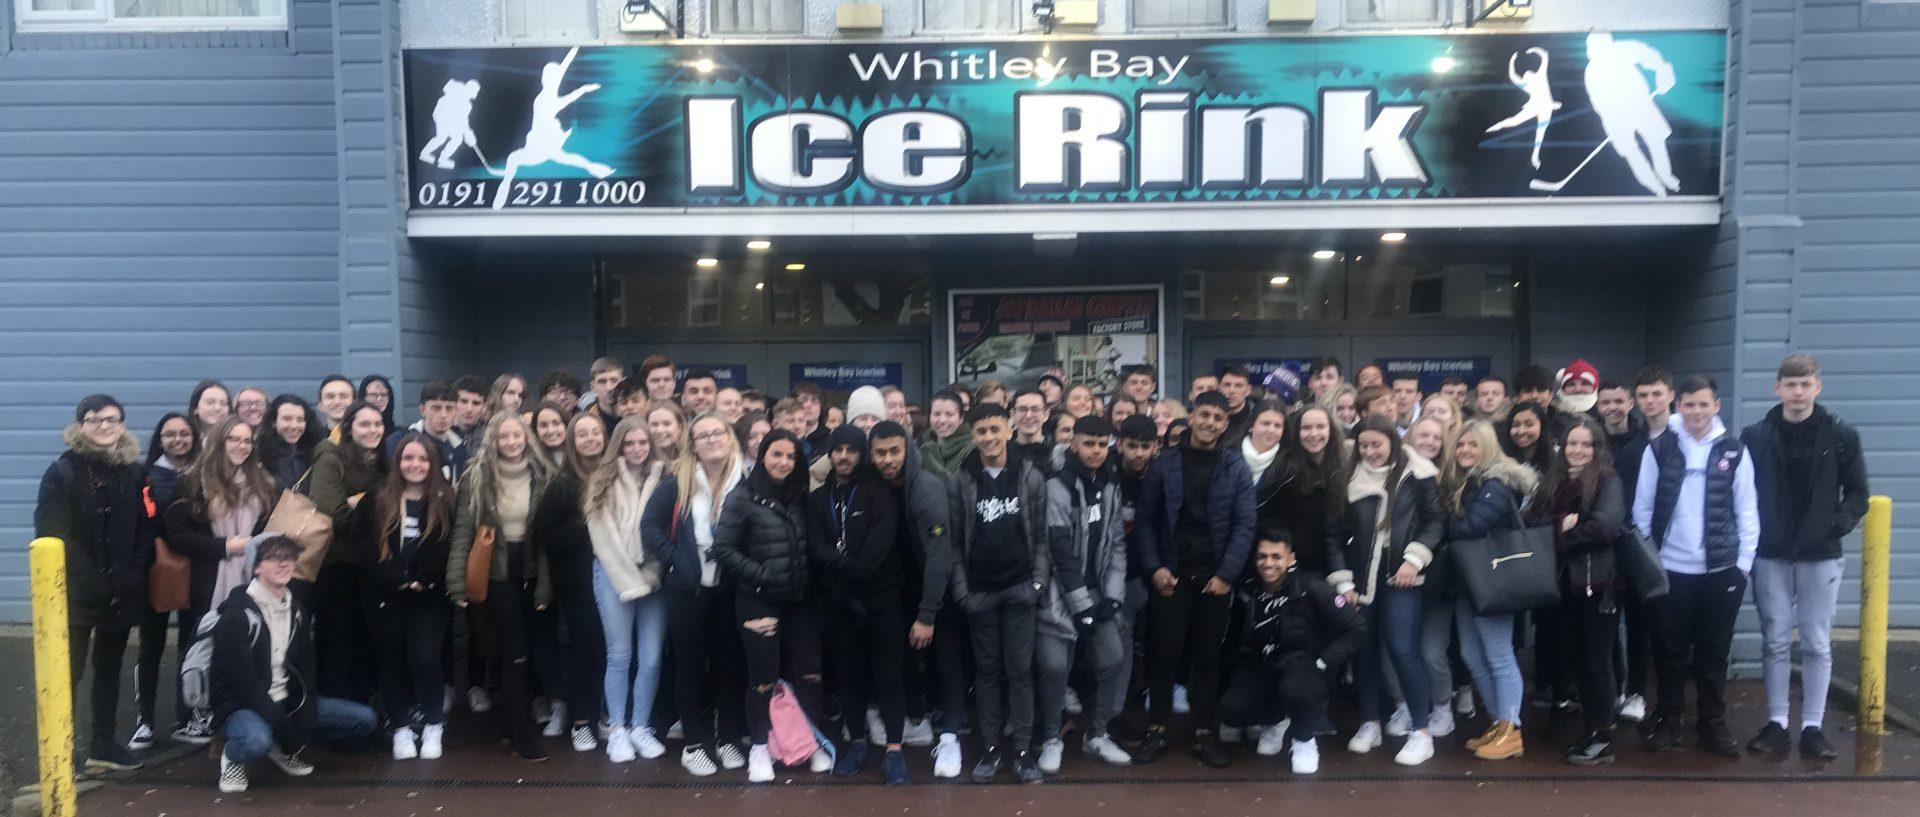 6th Form - Ice Skating - 2019